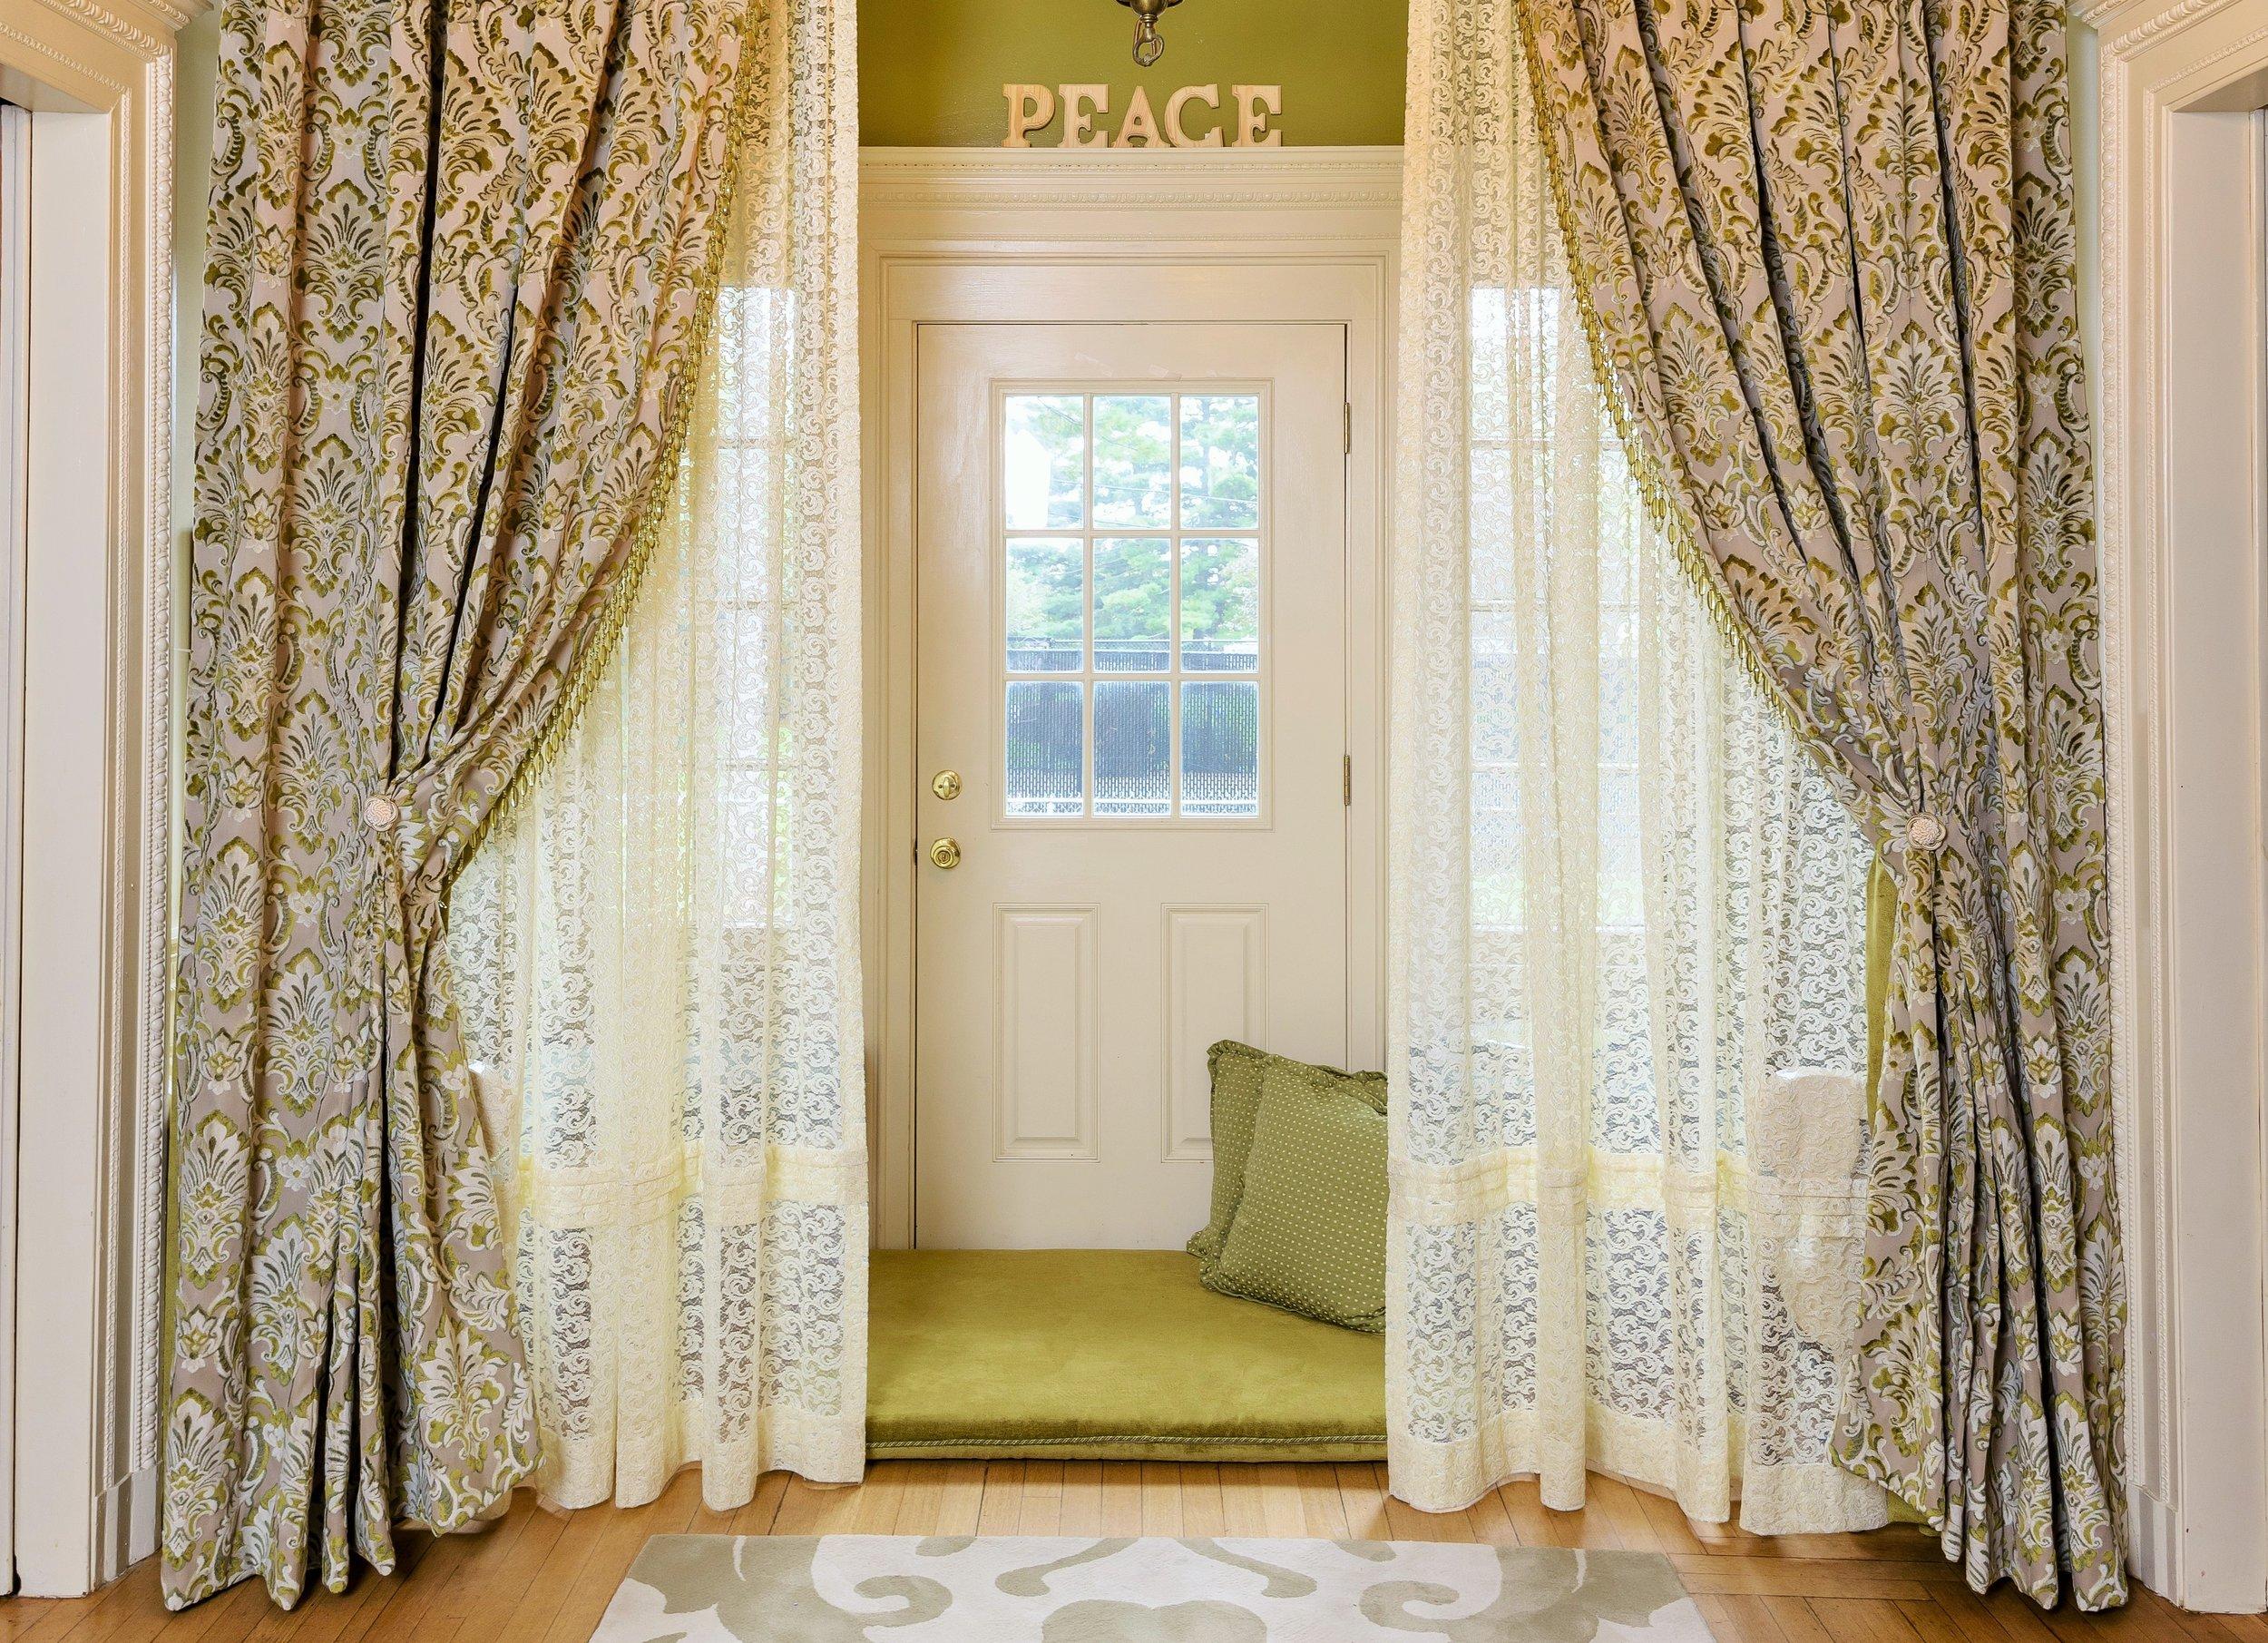 window-treatments-blinds-drapery-cornices-bedding-linens-windham-haverhill-6 (2).jpg